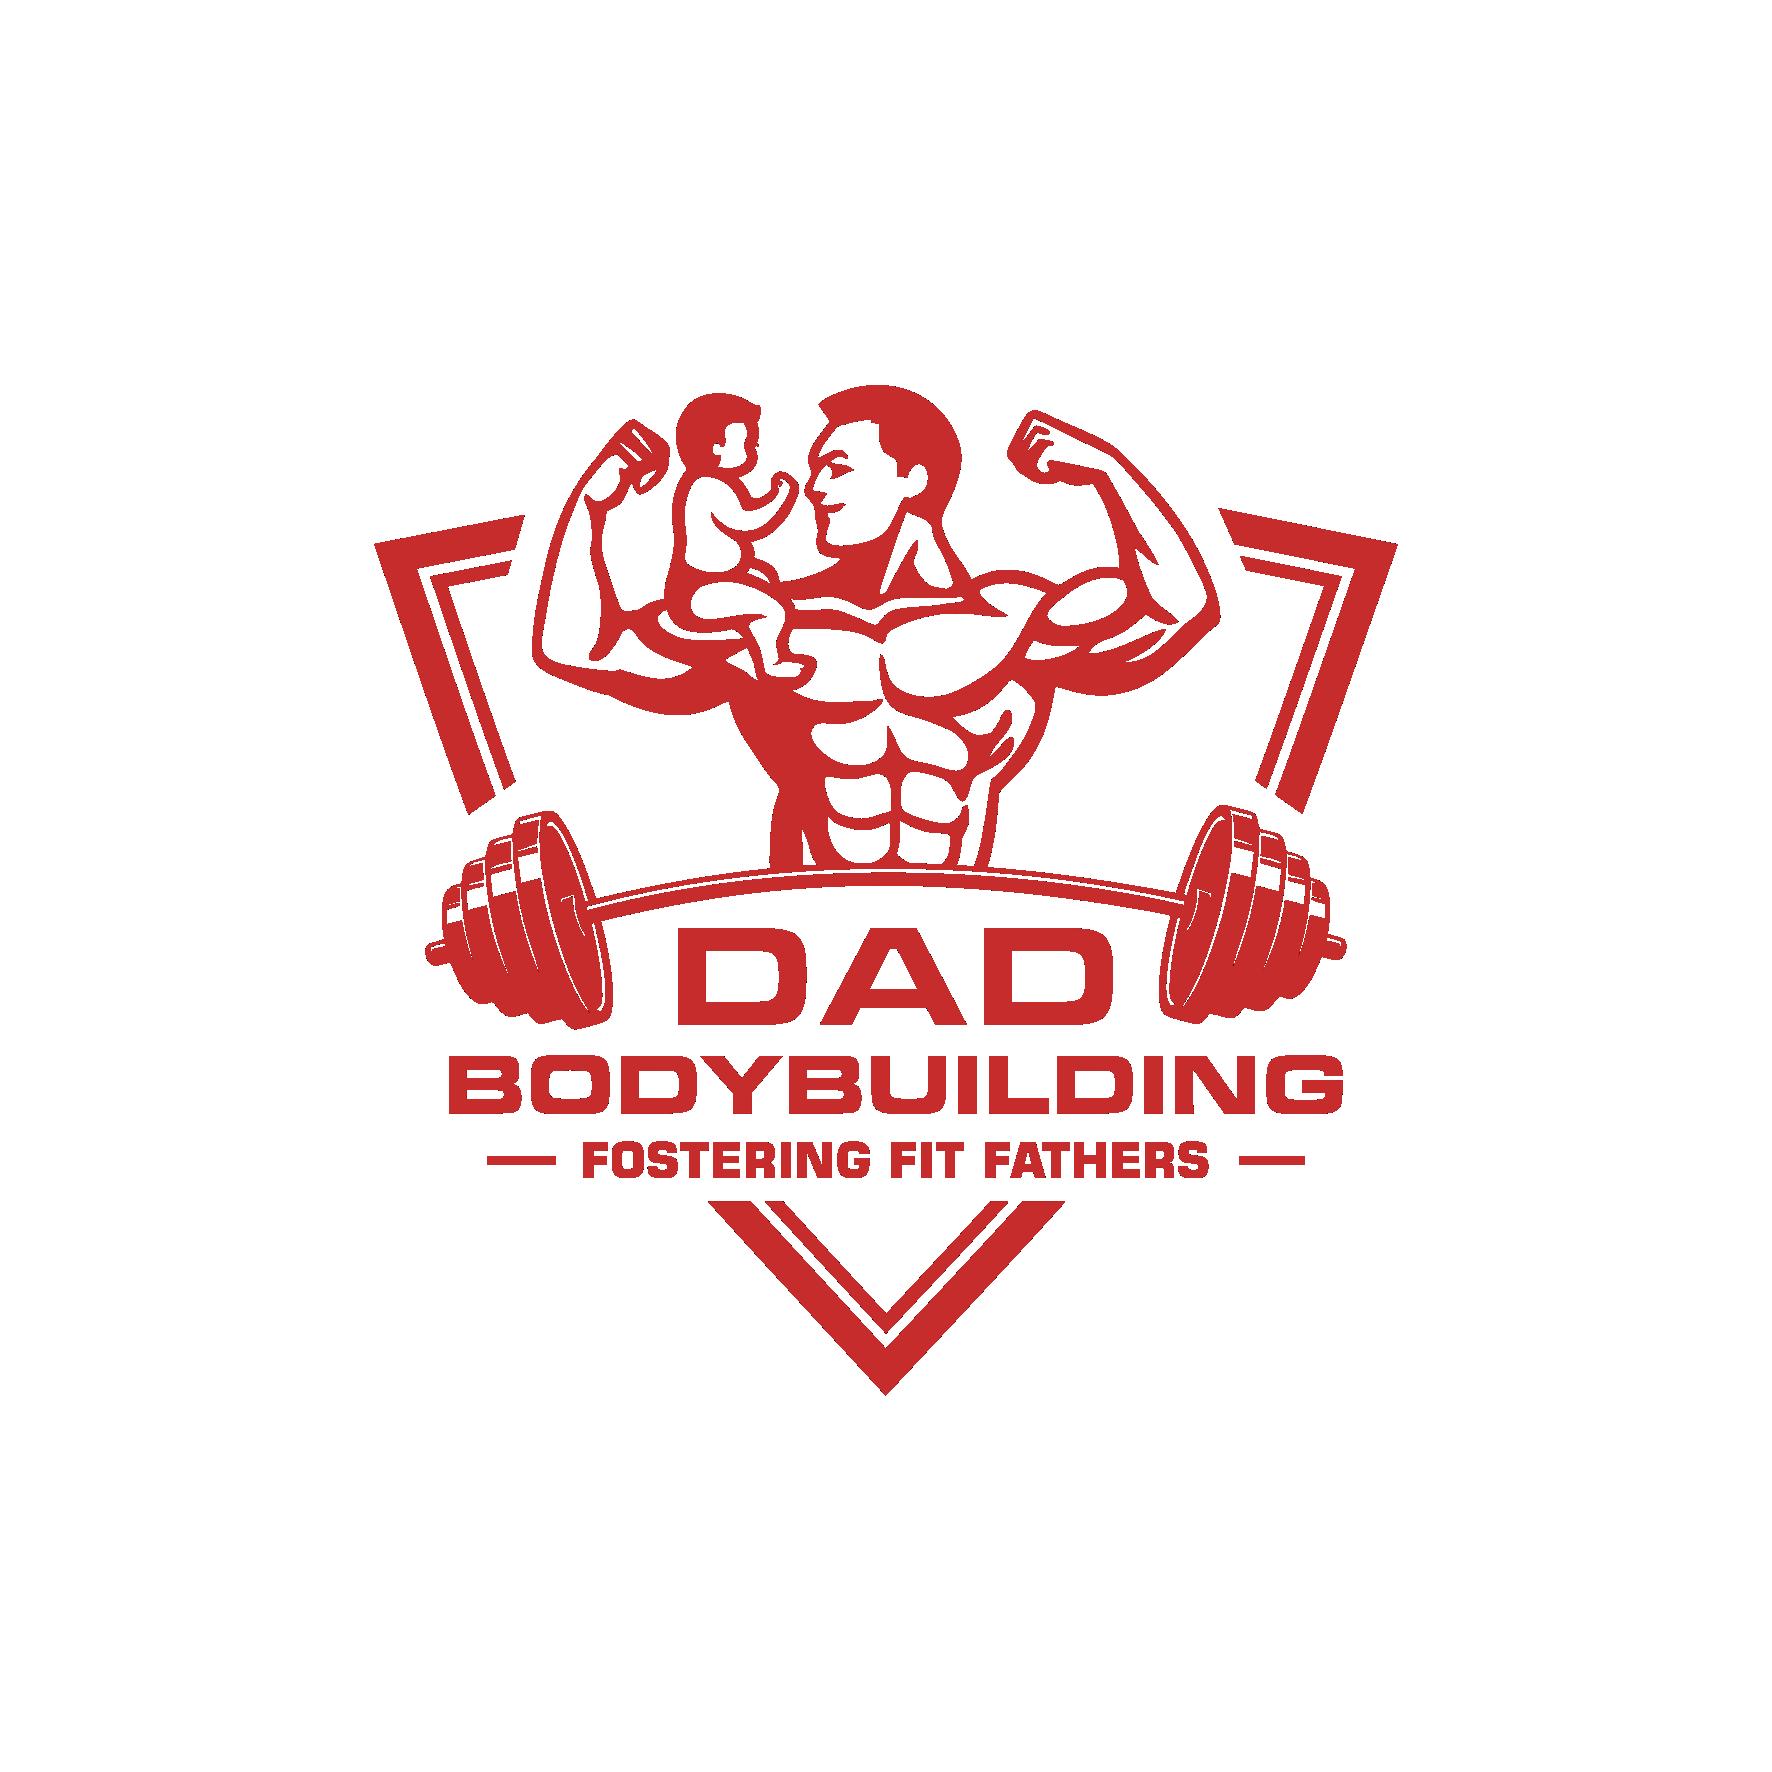 Bodybuilding/Health&Fitness company needs modern & unique branding